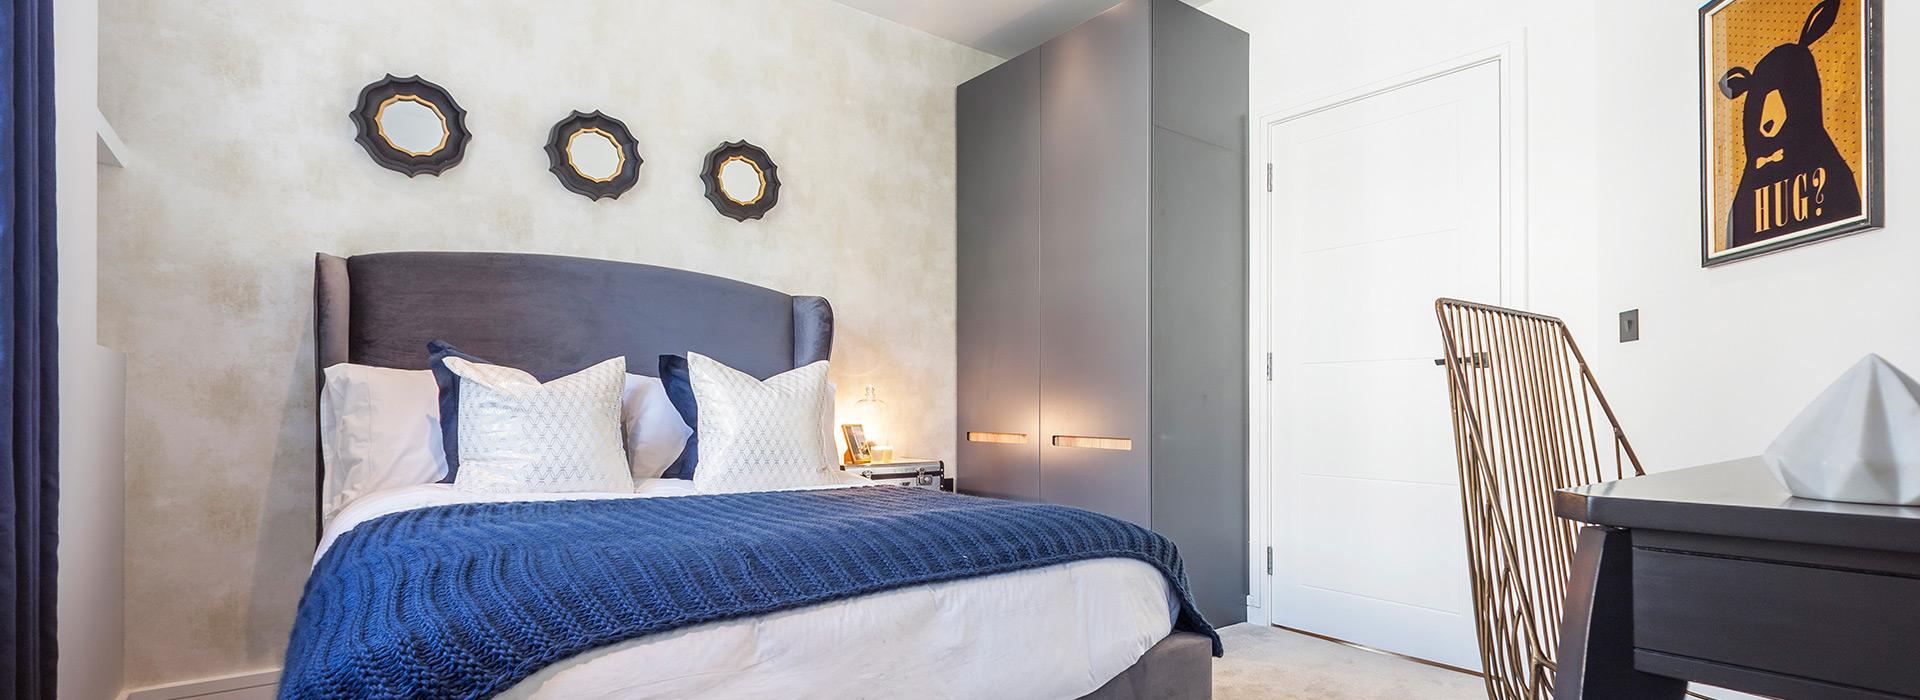 Stylish contemporary bedroom